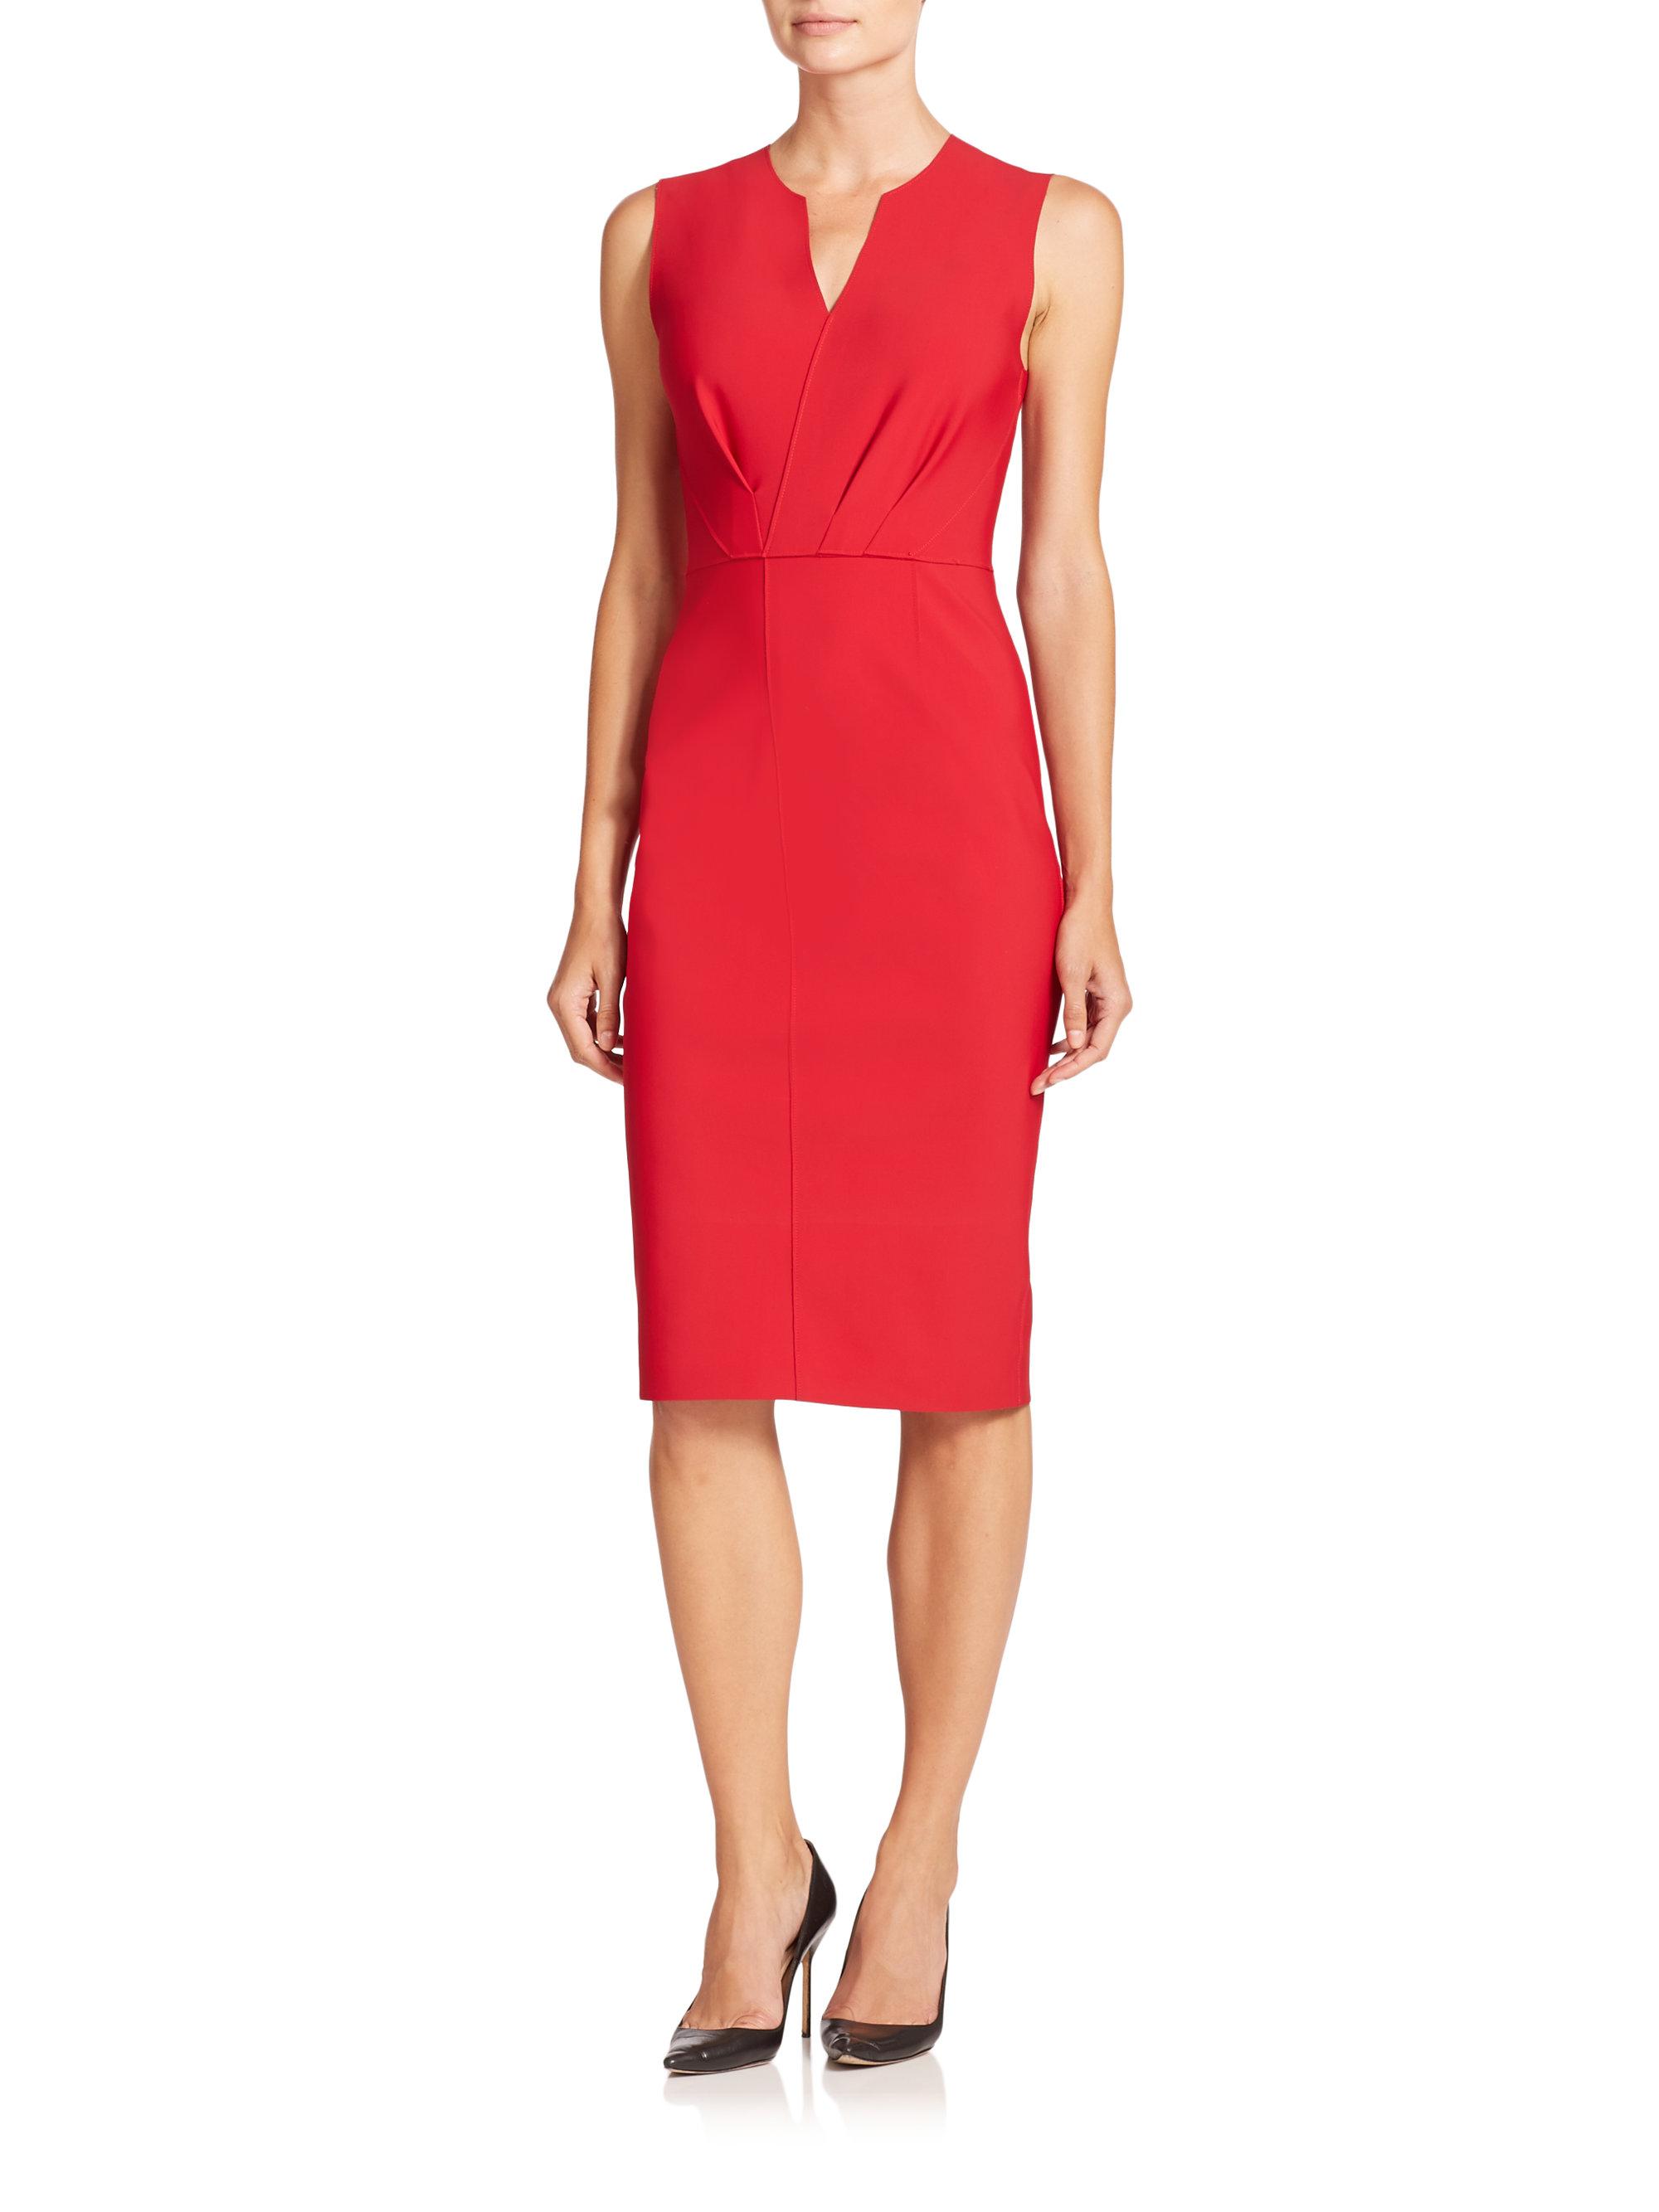 29750257a147 Elie Tahari Vernon Sheath Dress in Red - Lyst